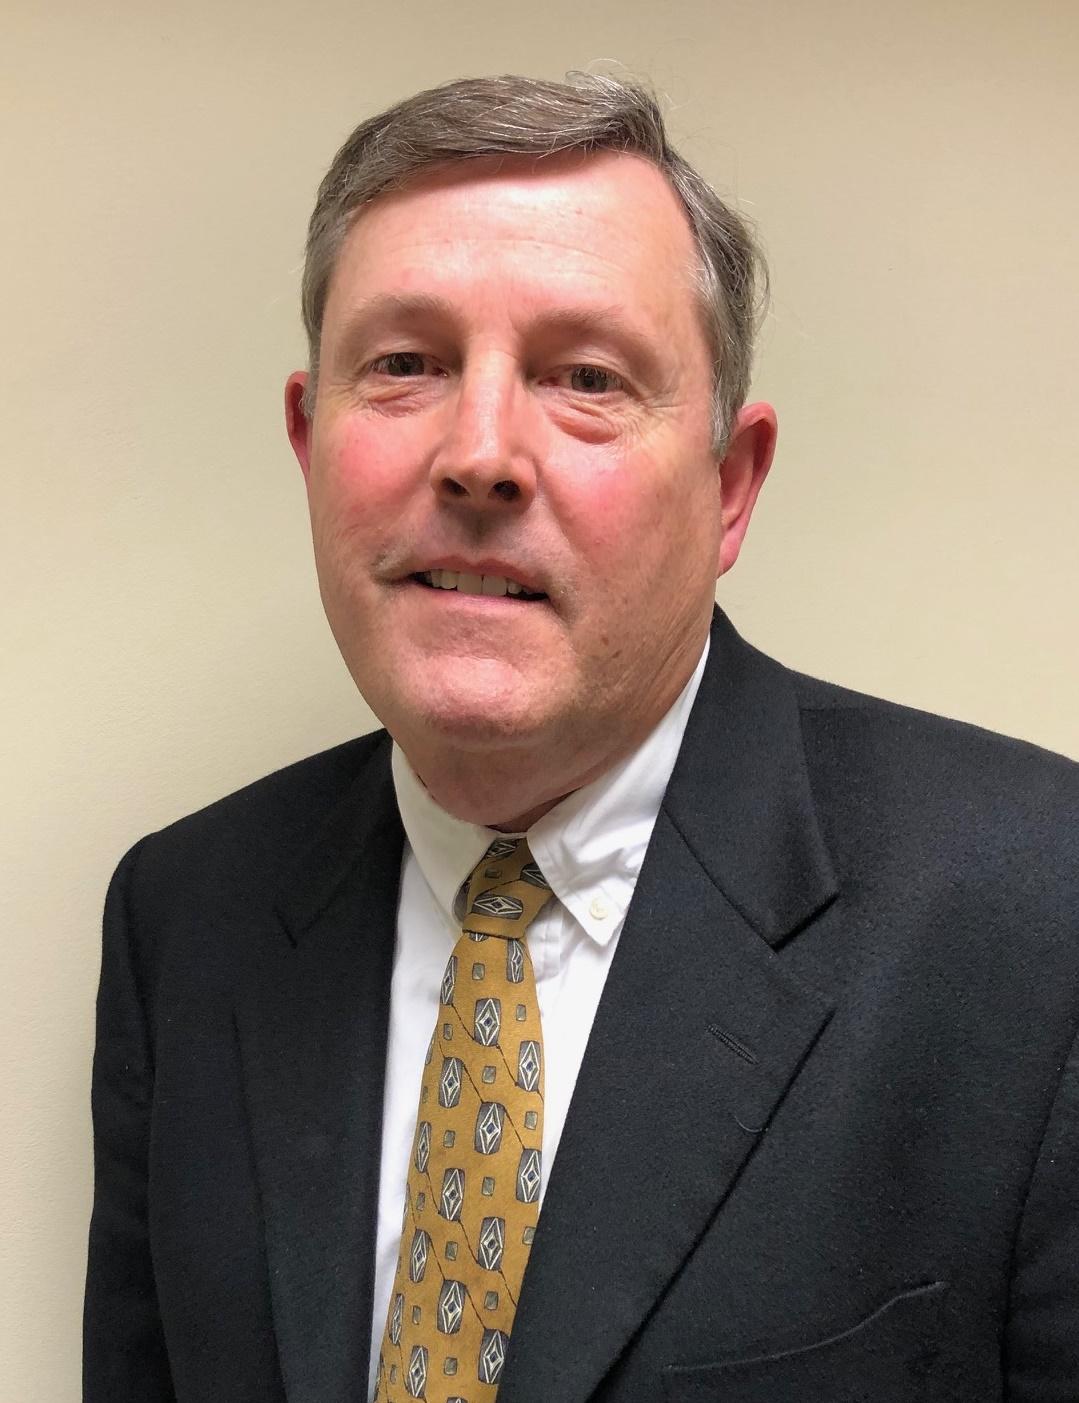 Steve Savarese Announces Randall Beesley, Ken Washington Joining AHSAA Beginning June 1